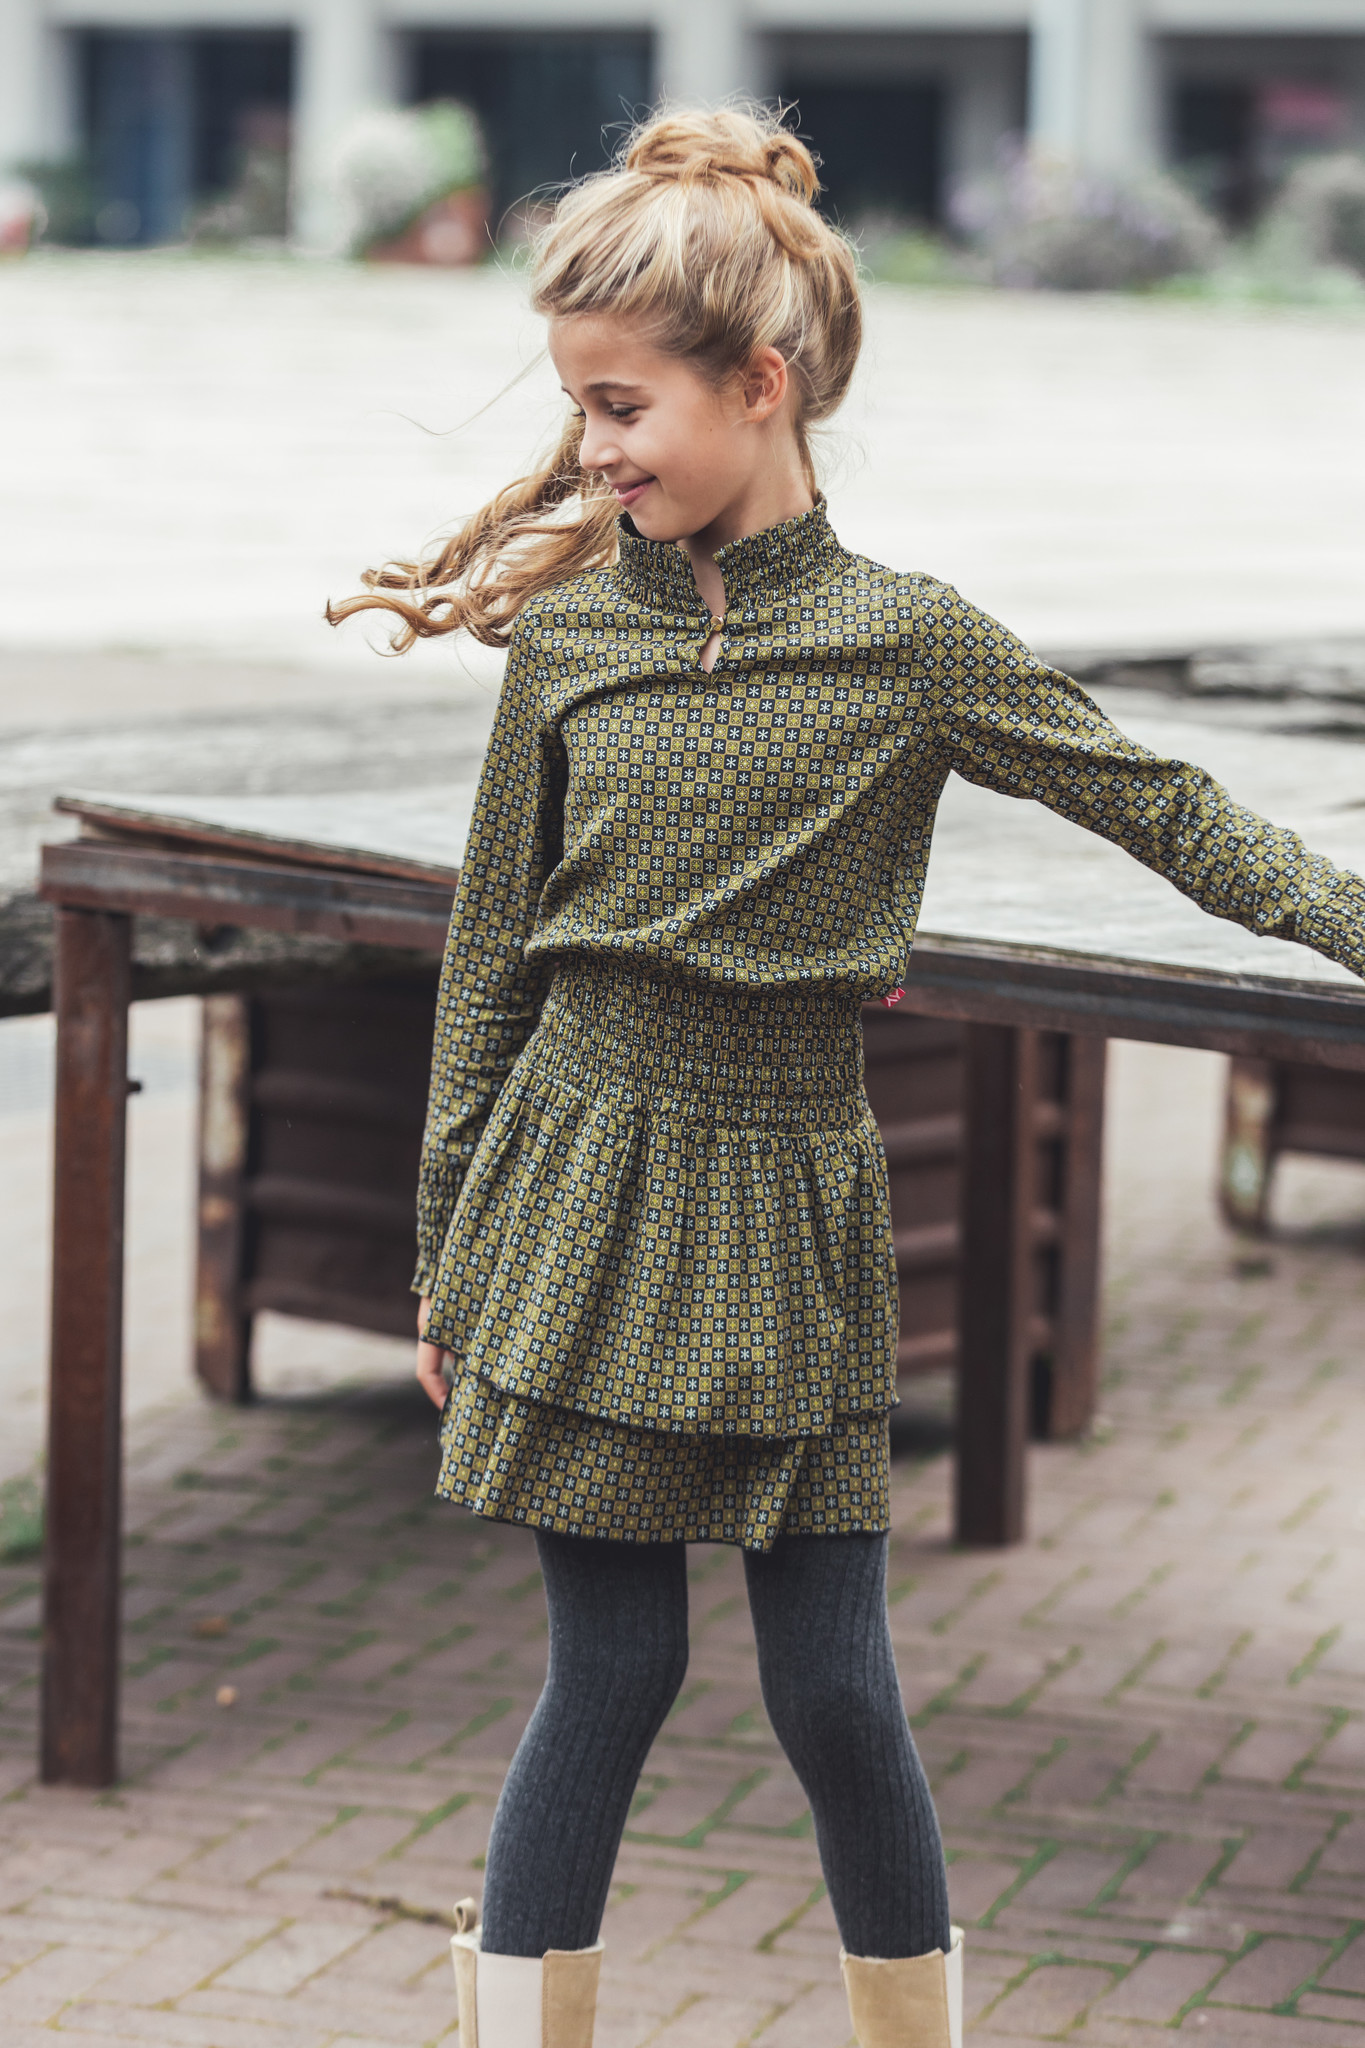 Mayce Girlslabel lookbook winter 2022-30